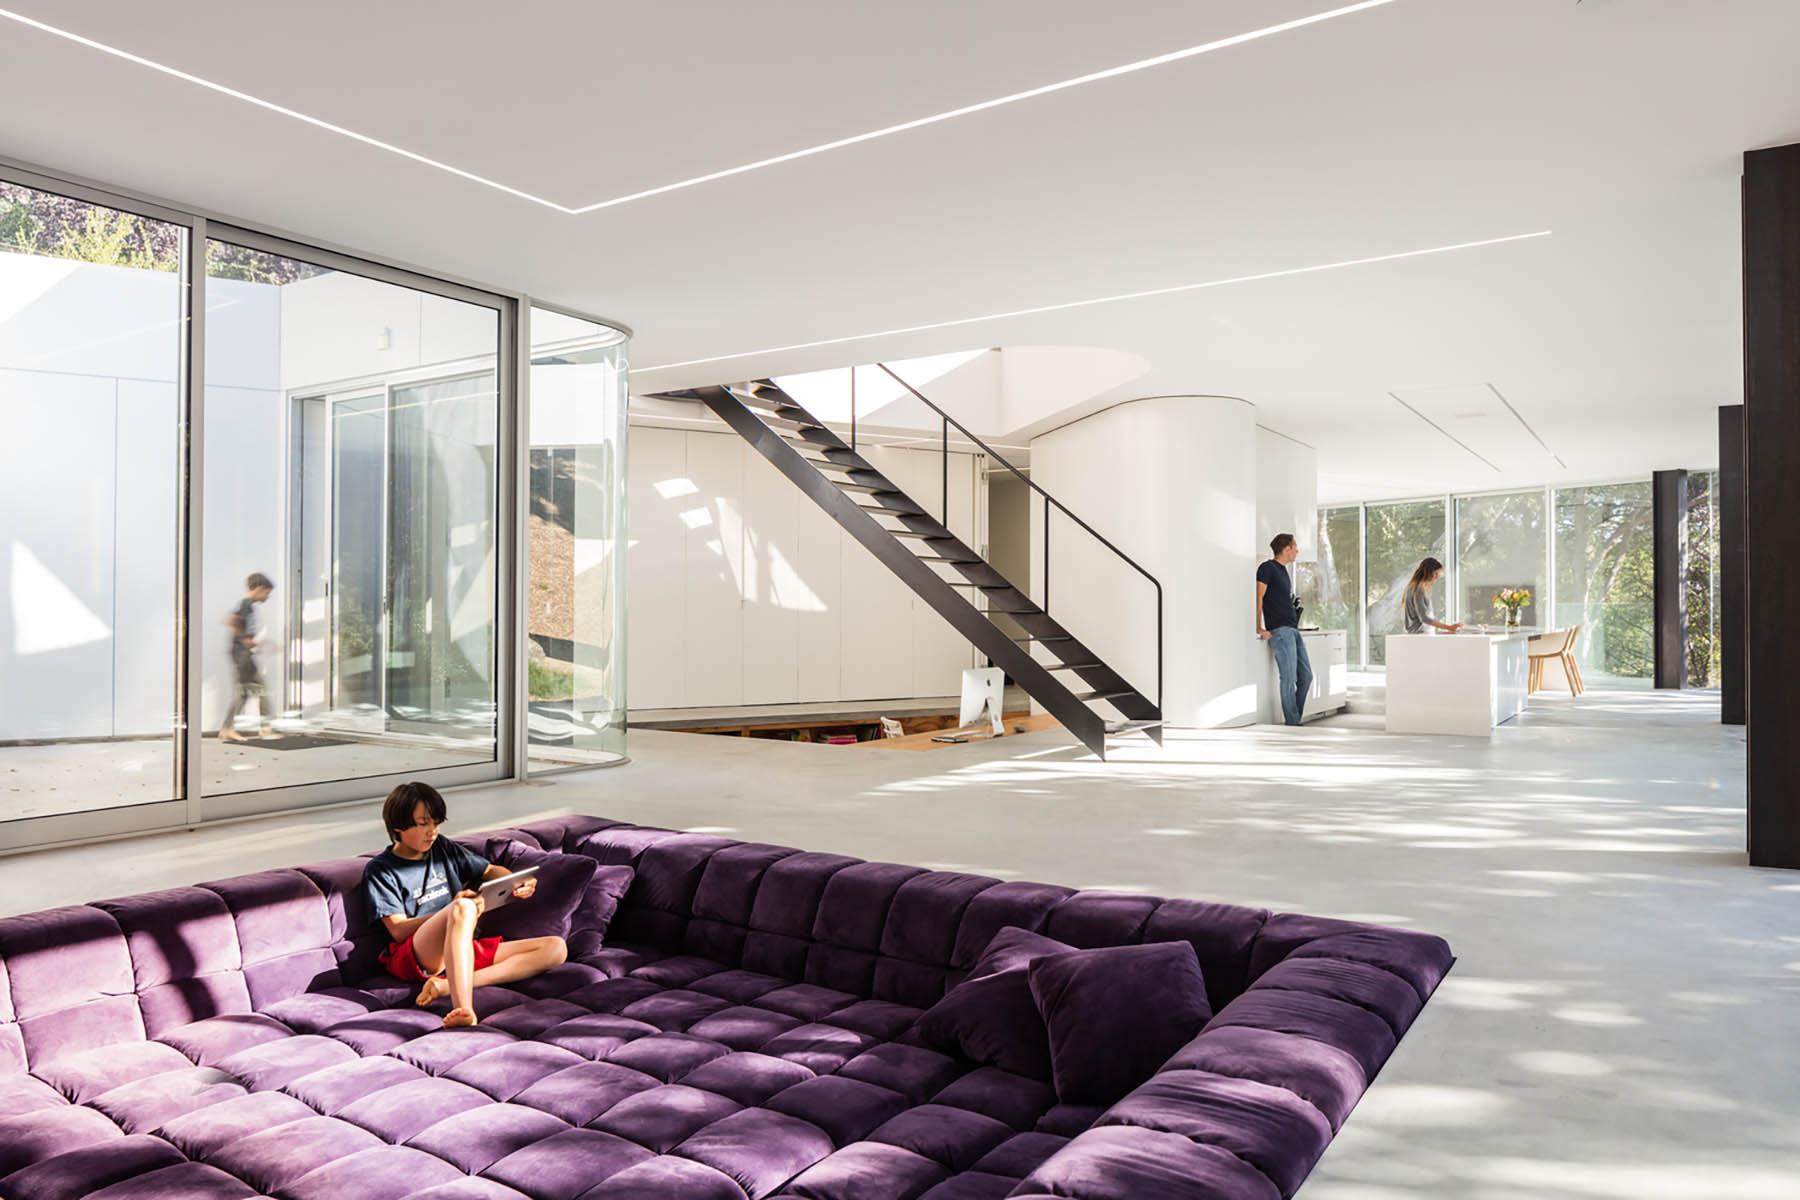 iGNANT-Architecture-Craig-Steely-Pam-Pauls-House-019b